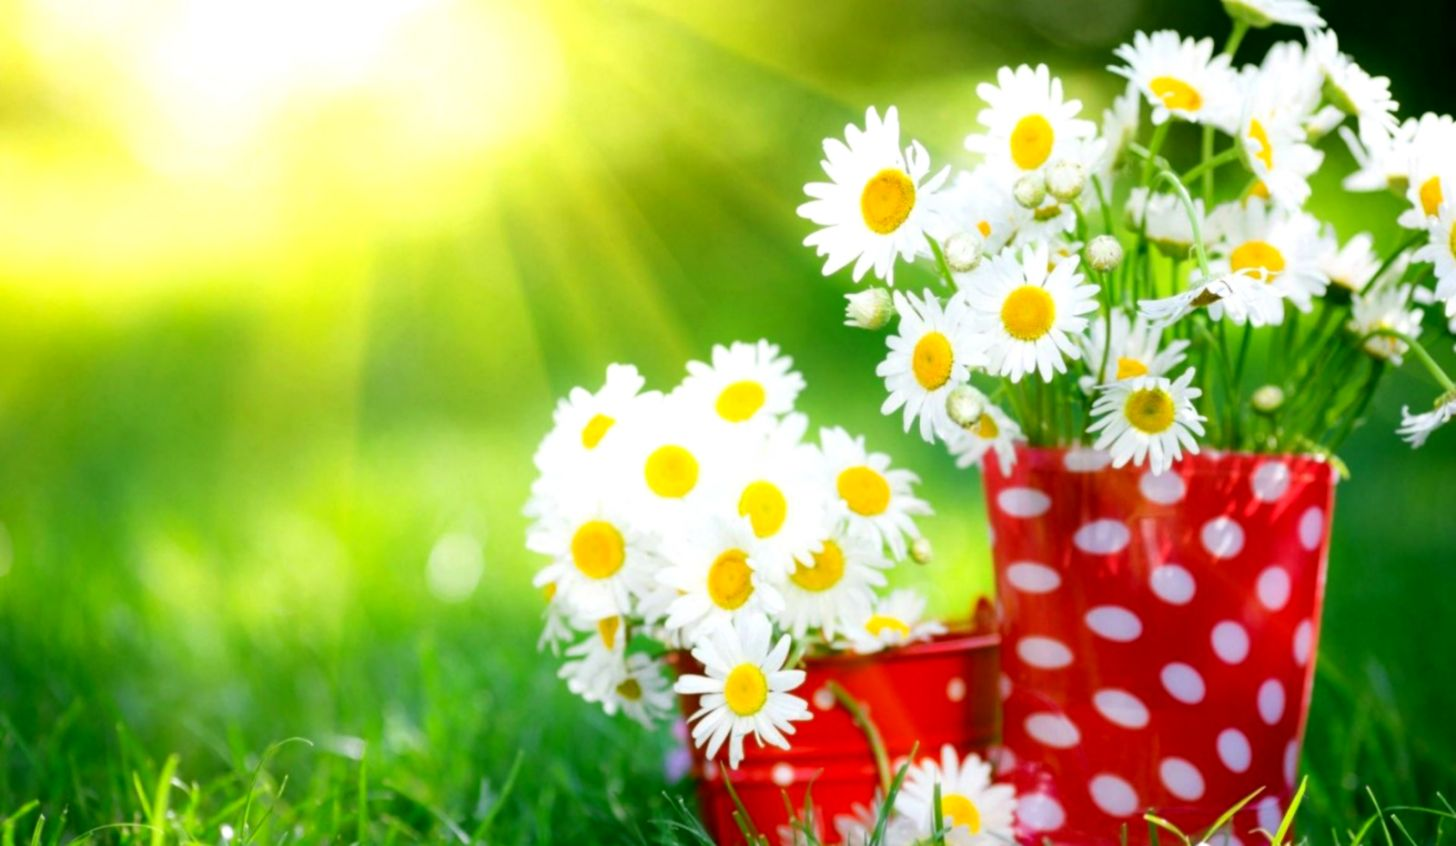 Flowers Nature Wallpapers Desktop Backgrounds Hd